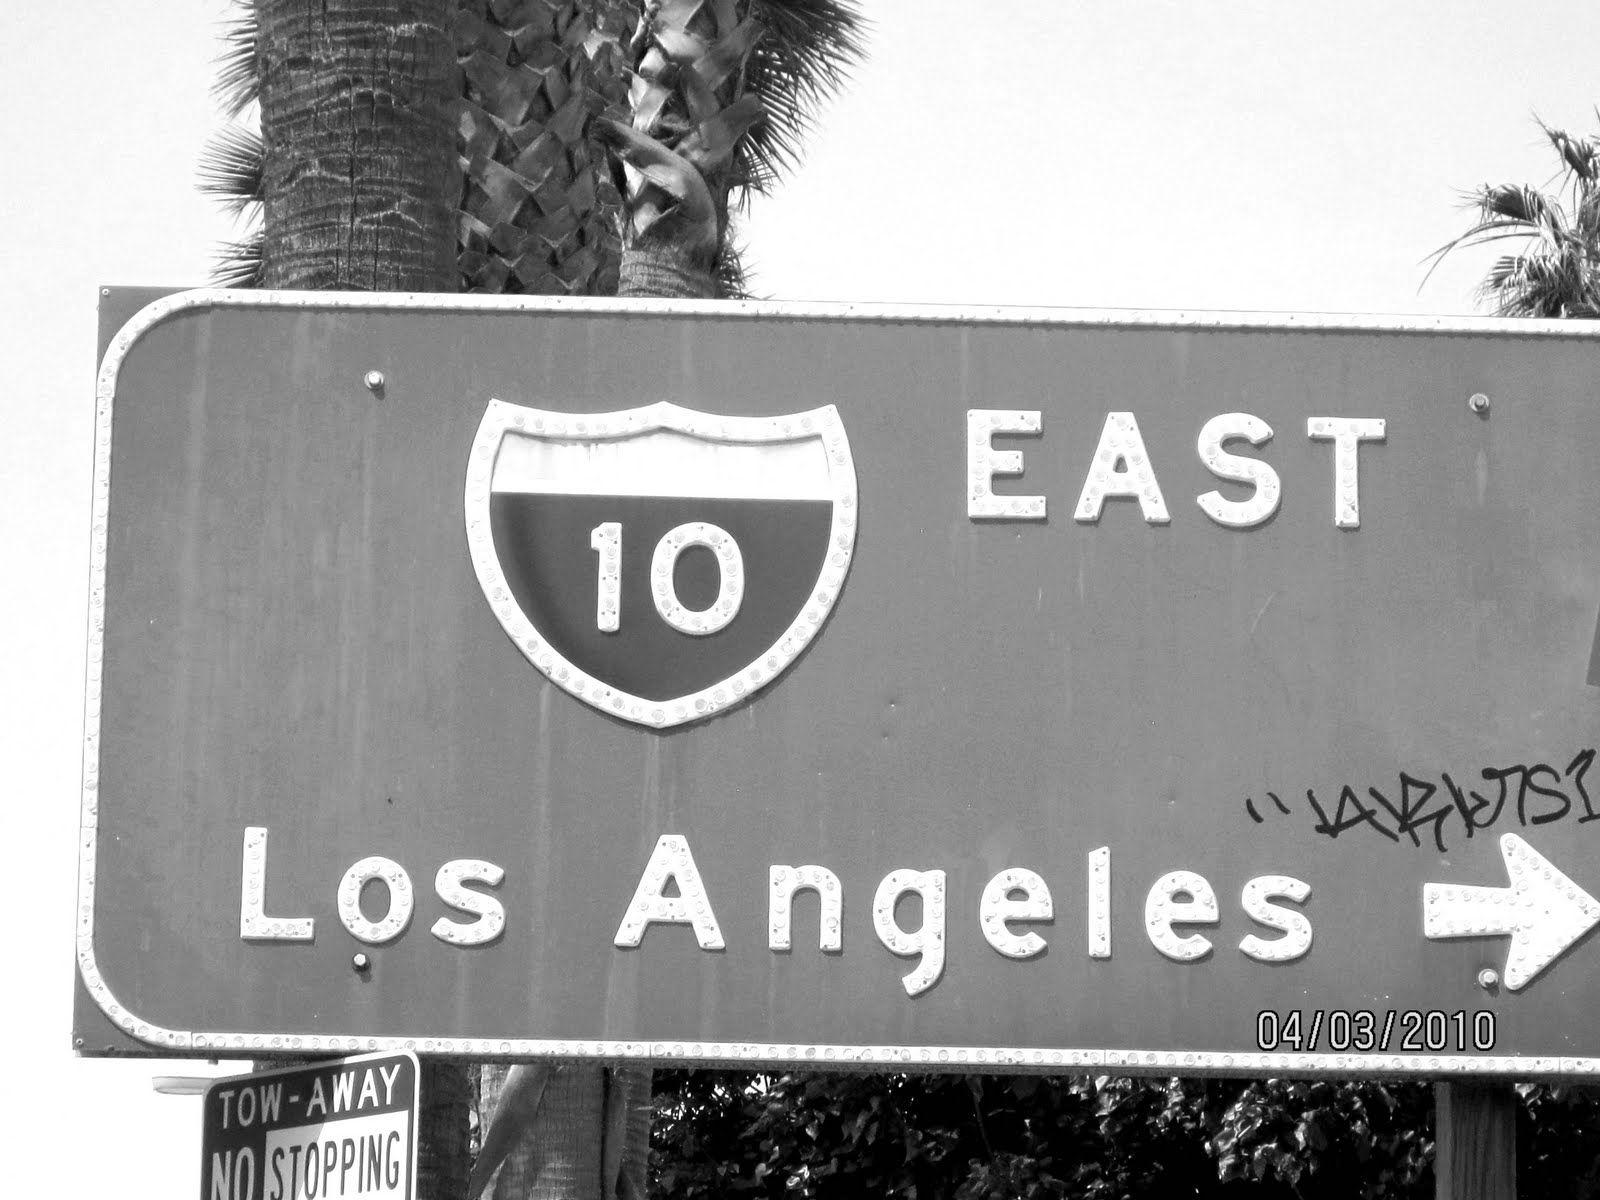 10 Los Angeles East